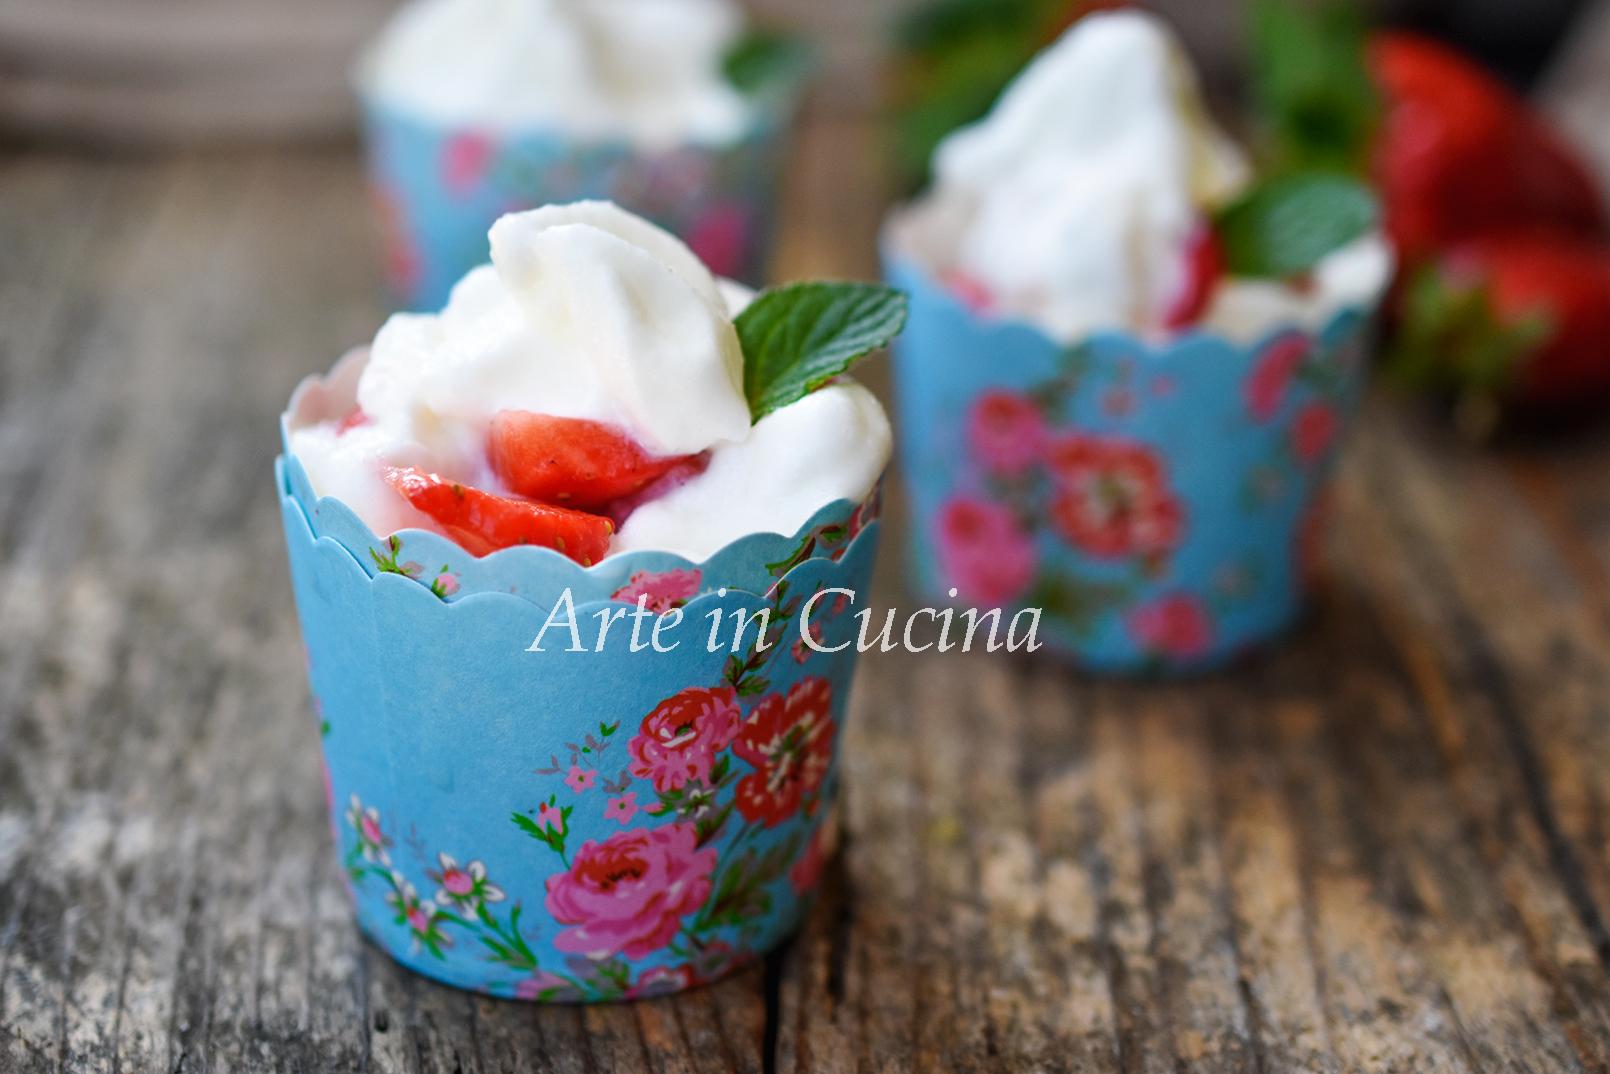 Gelato fiordilatte senza panna con fragole con o senza gelatiera vickyart arte in cucina